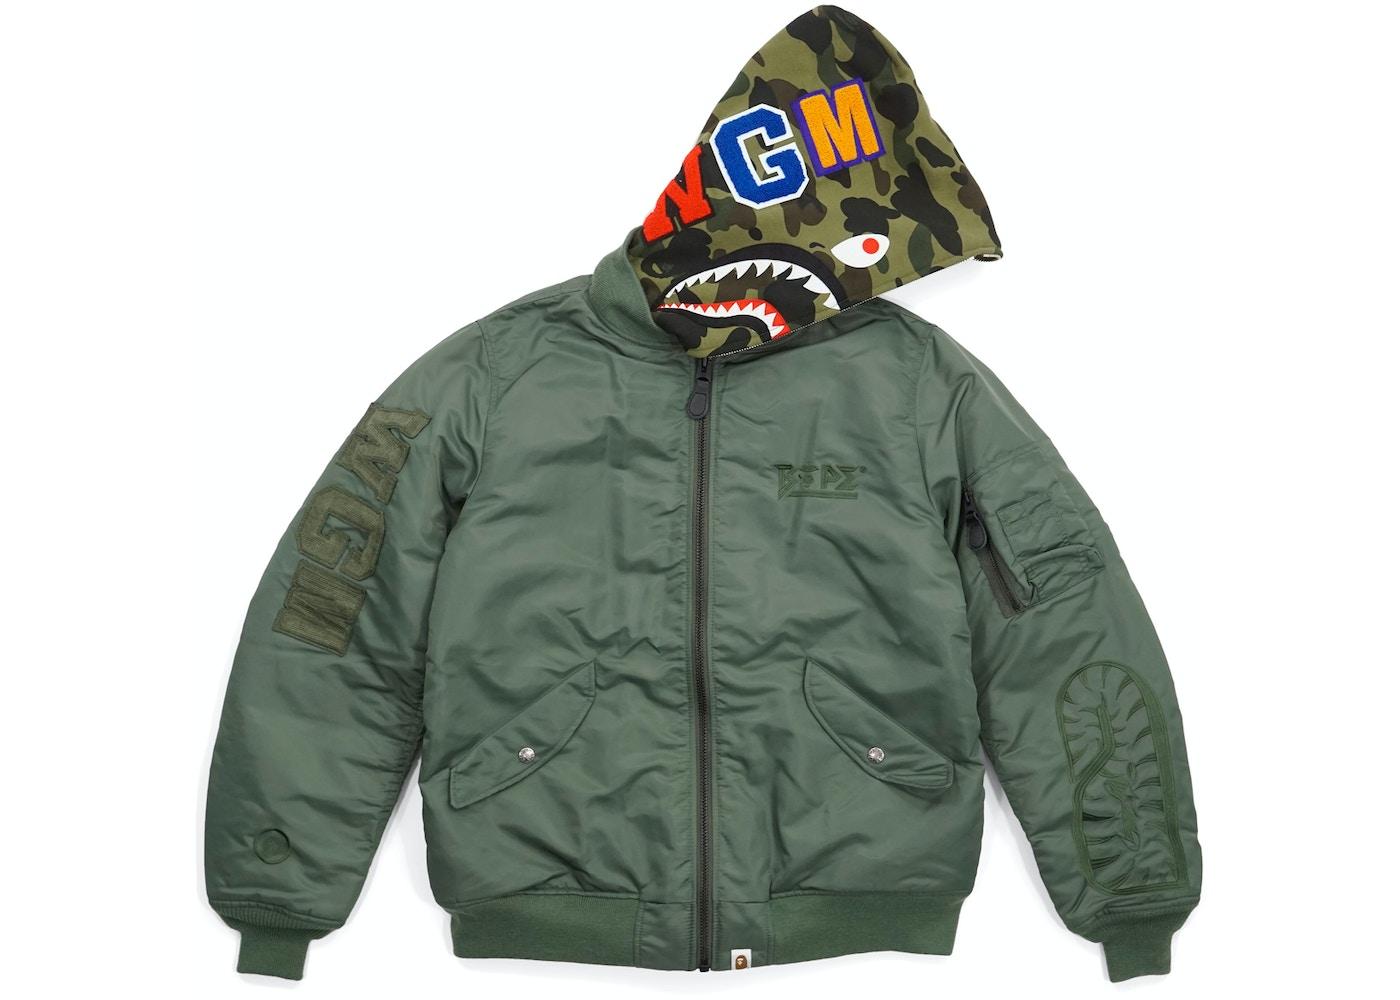 BAPE Military Rock Star 1st Camo Convertible Shark MA1 Bomber Jacket ... 9dad029424